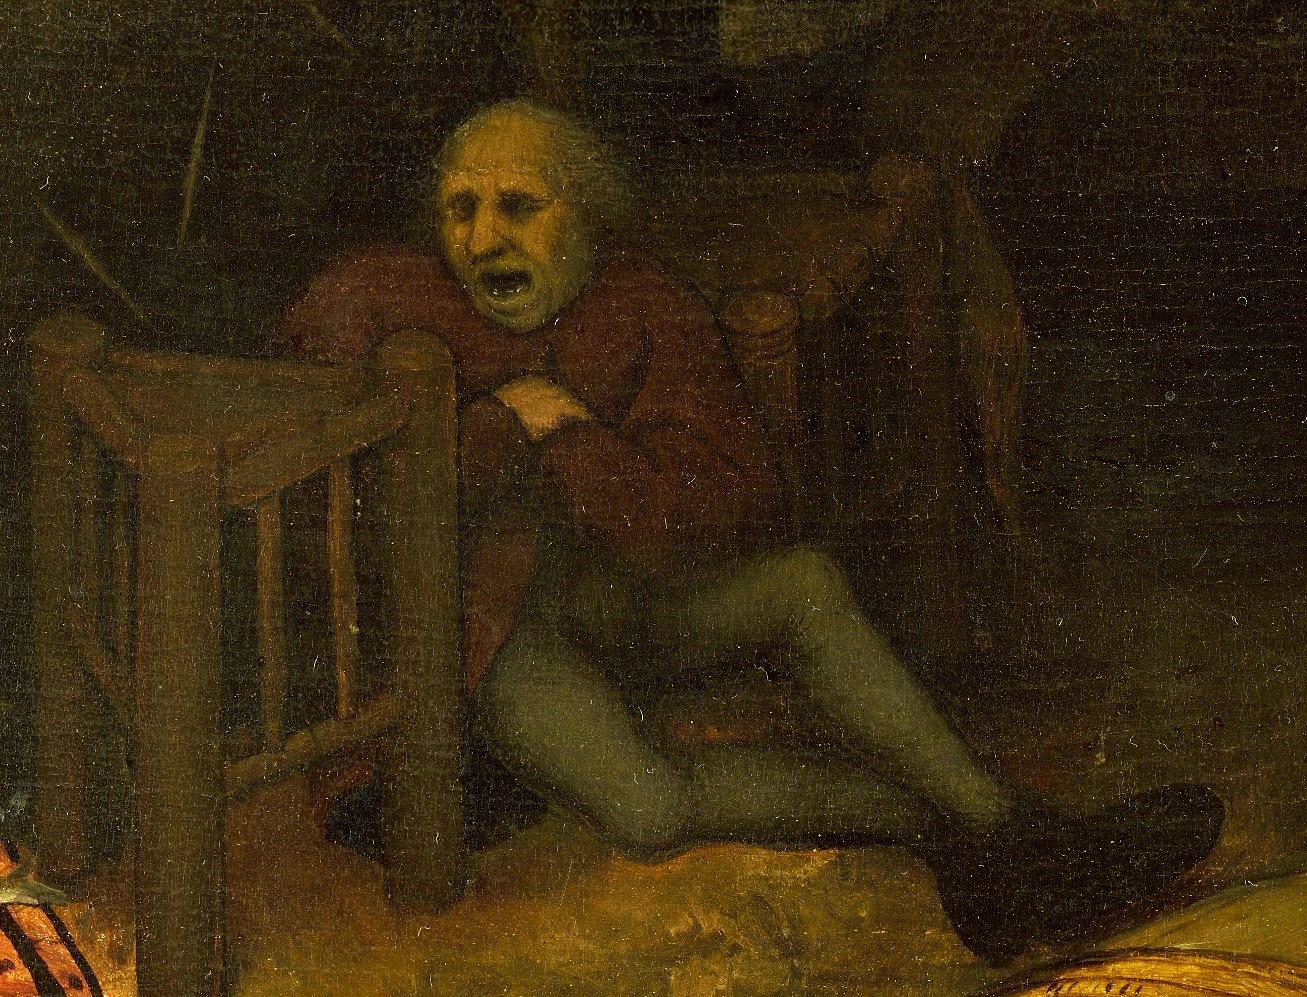 brueghel-proverbs-008.jpg